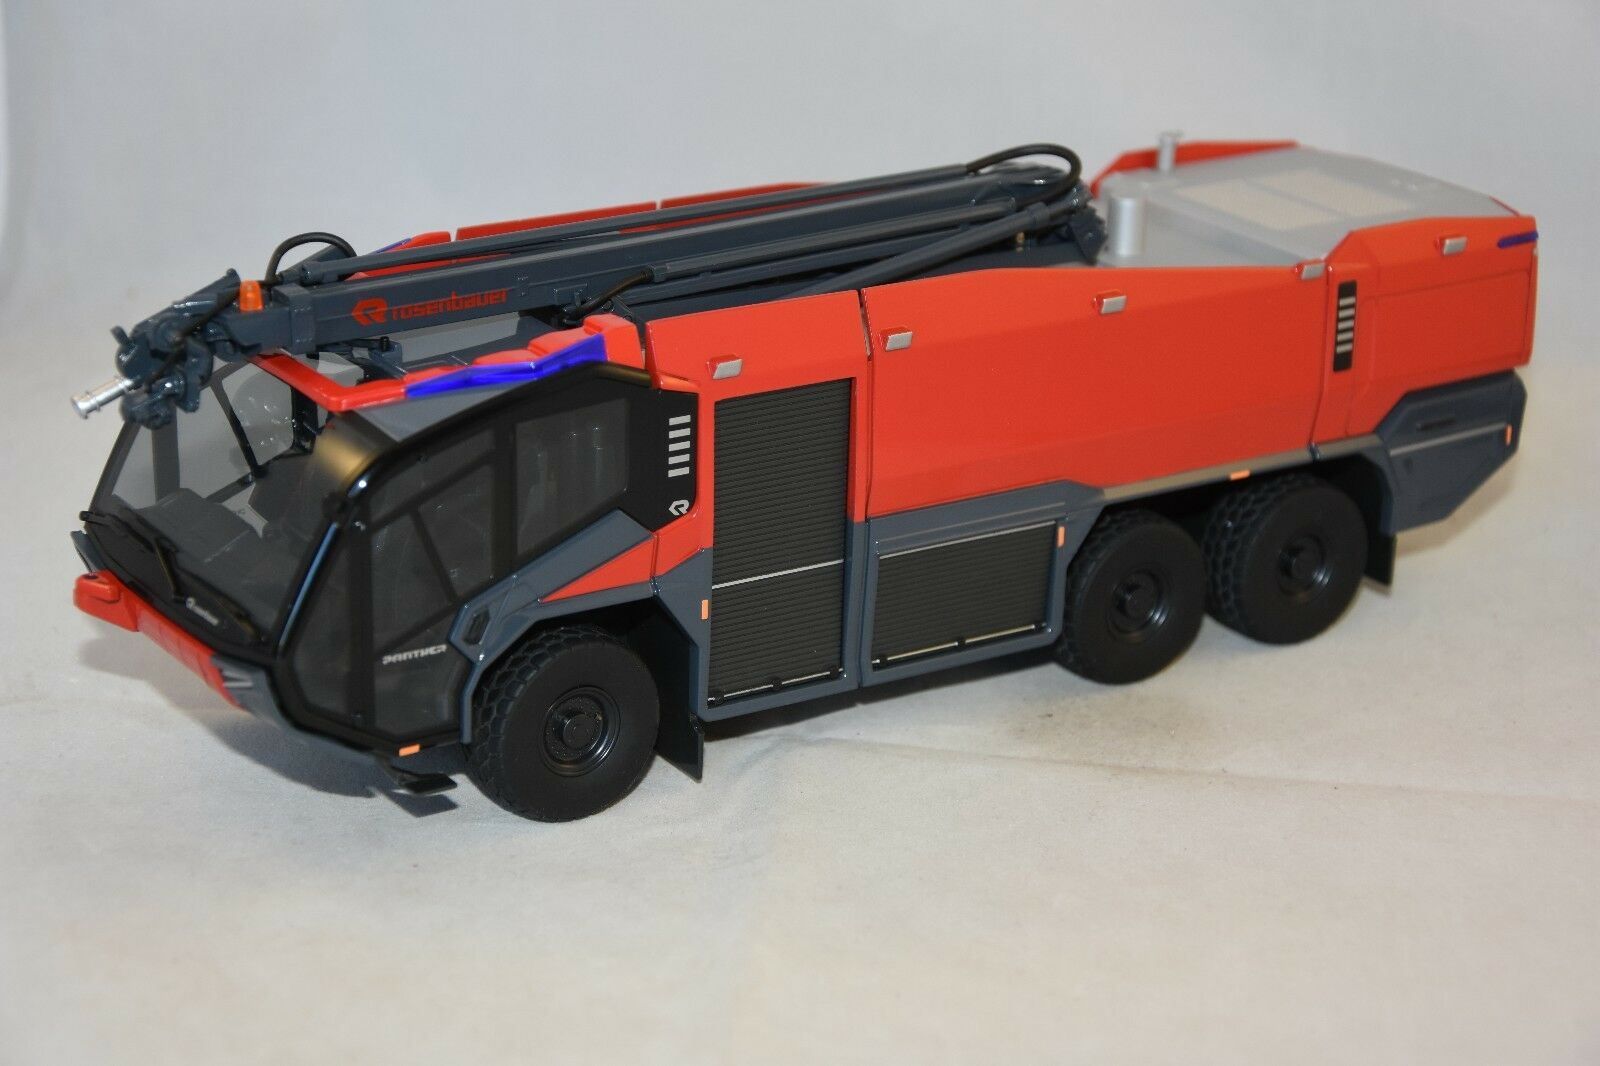 Wiking WIKING7614 - PANTHER ROSENBAUEUR FLF 6X6 AVEC TOURELLE ESCA Pompiers 1 43